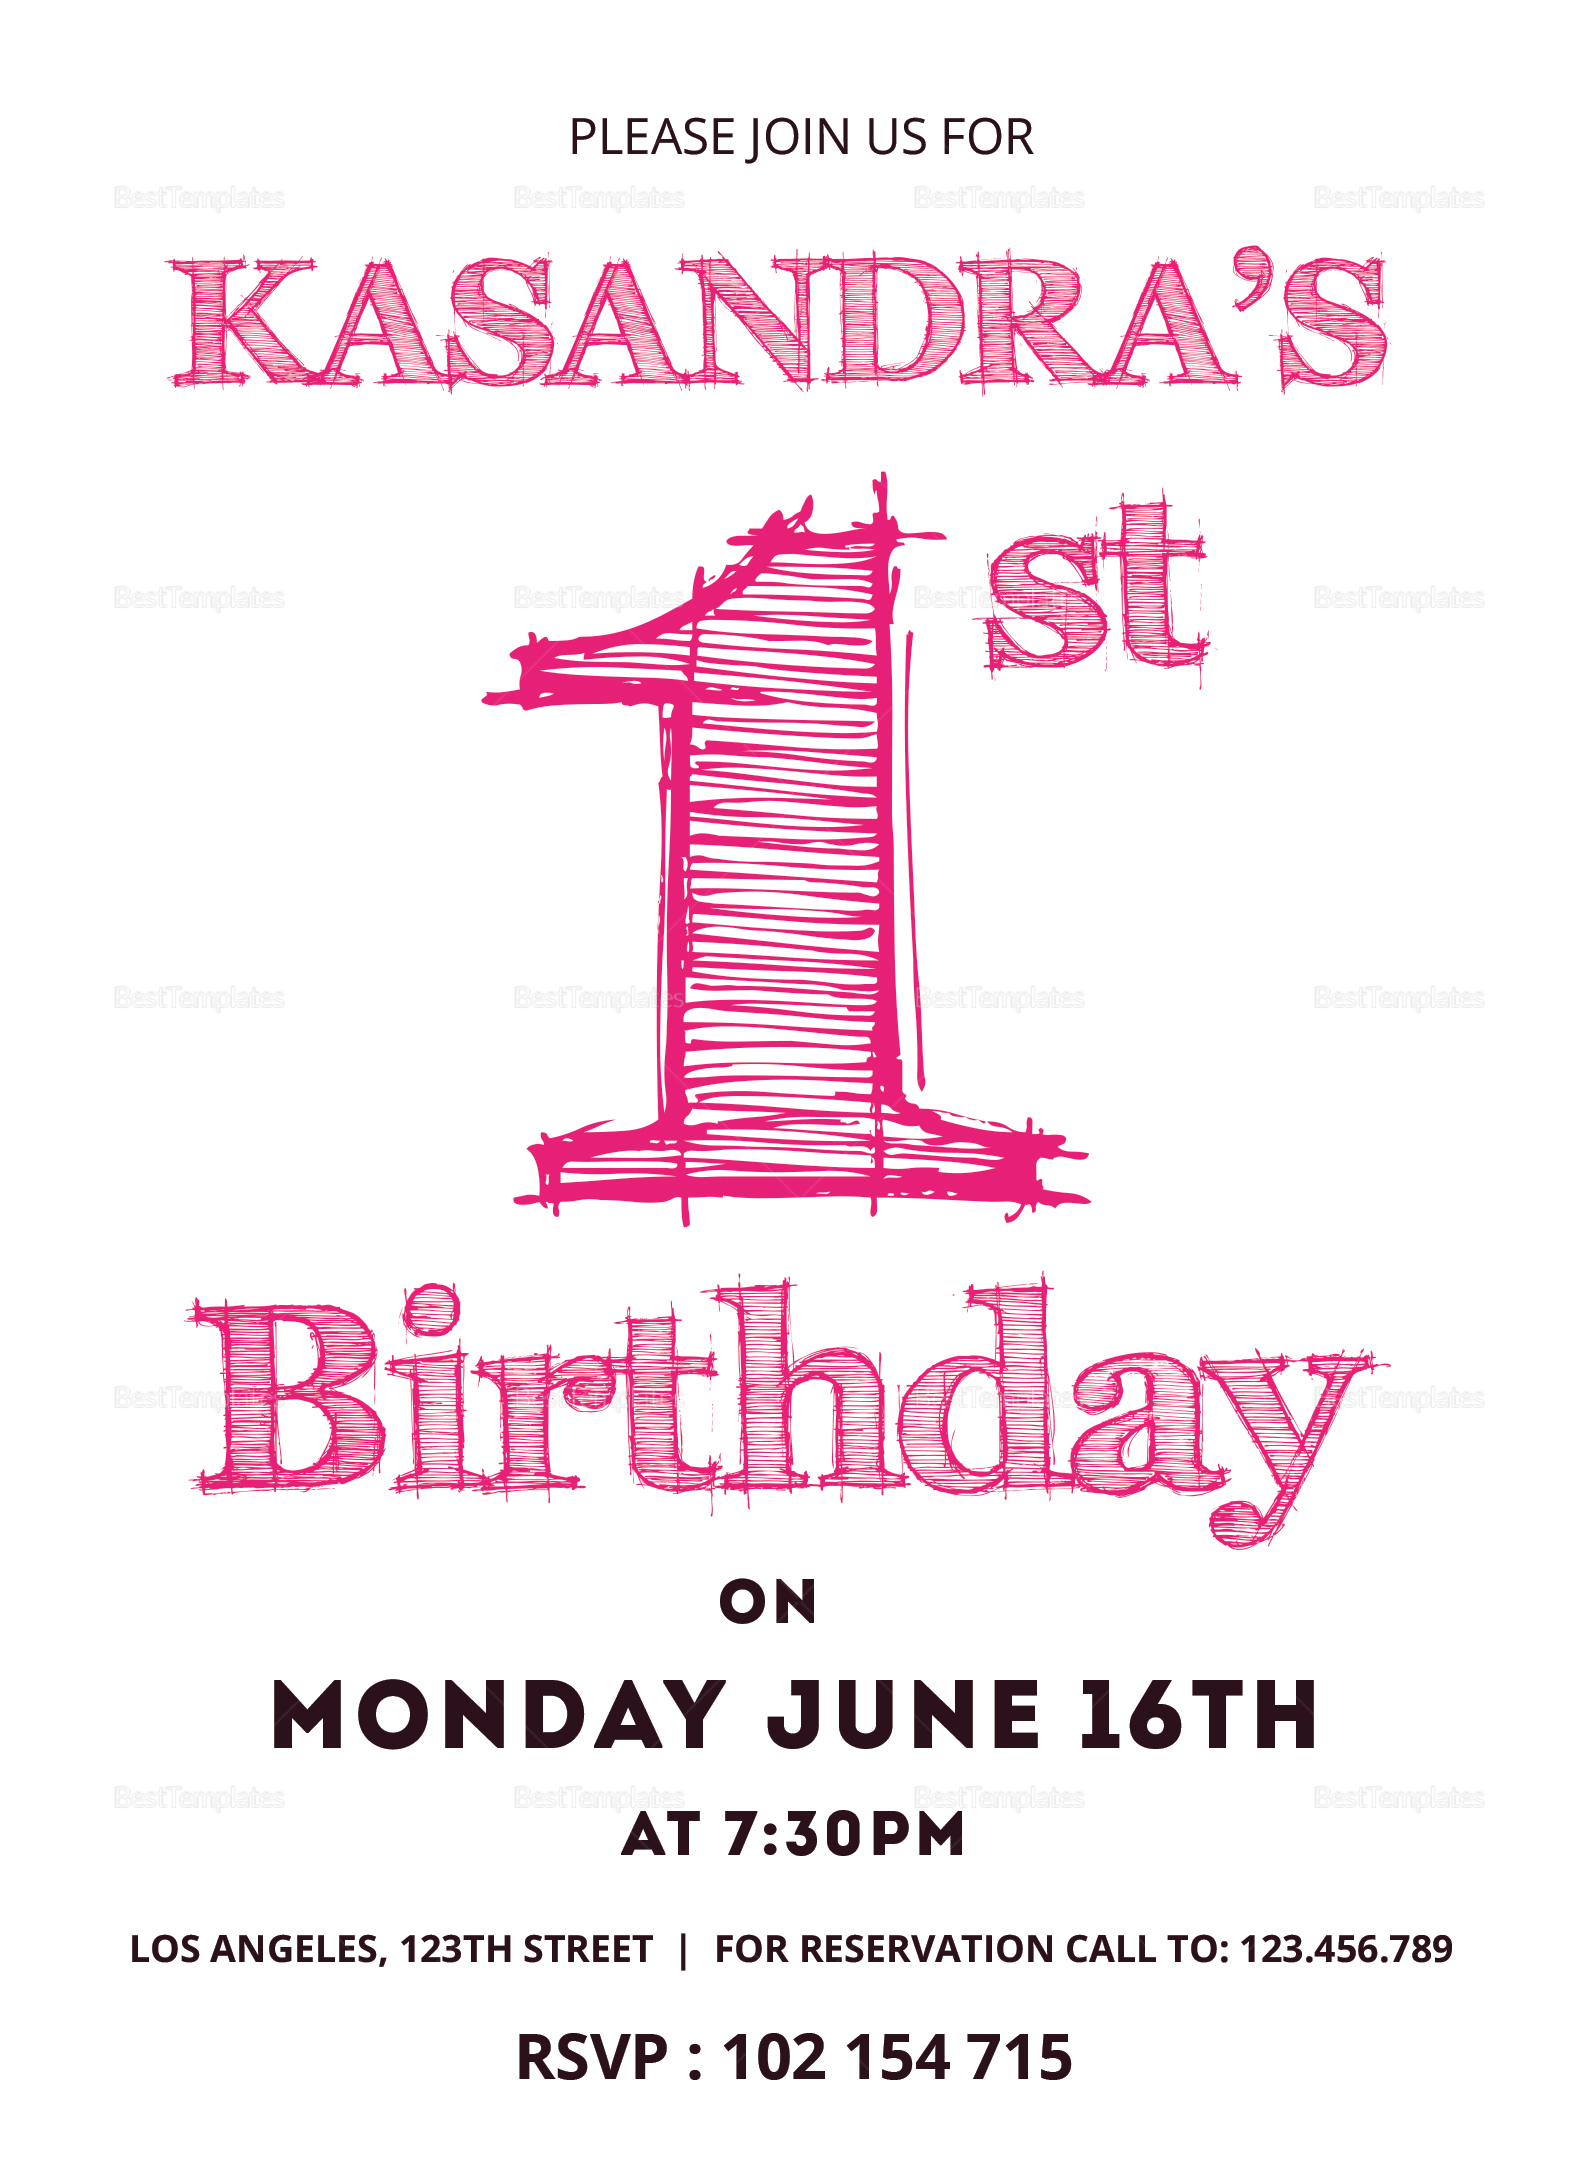 1st Birthday Invitation Card Design Template